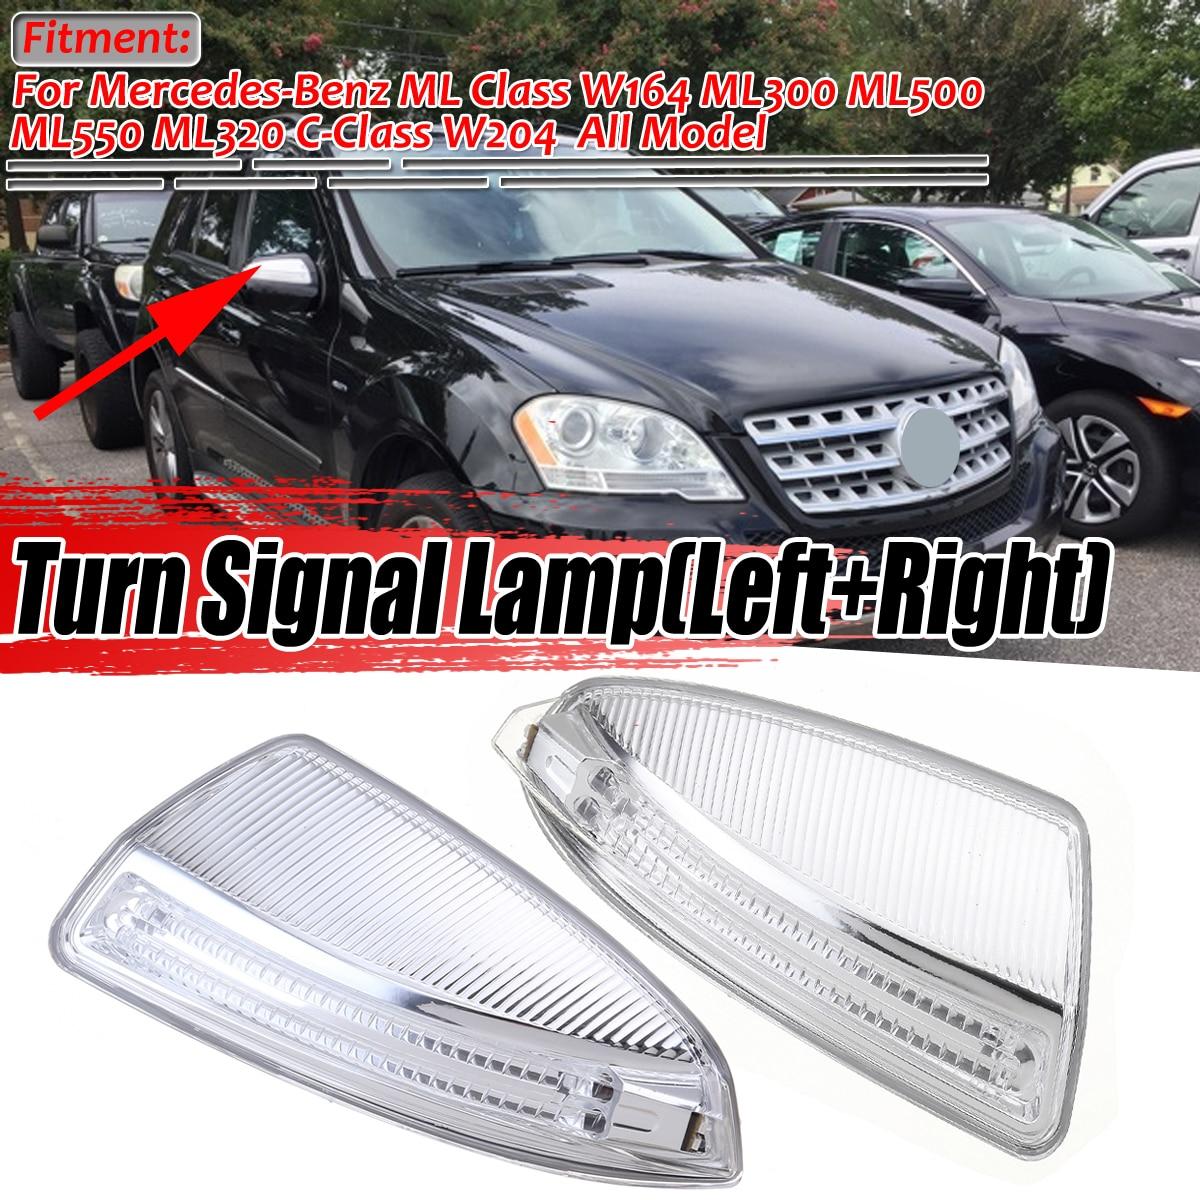 Mirror Indicator Turn Signal Light Left /& Right For Mercedes W204 C300 C350 C63